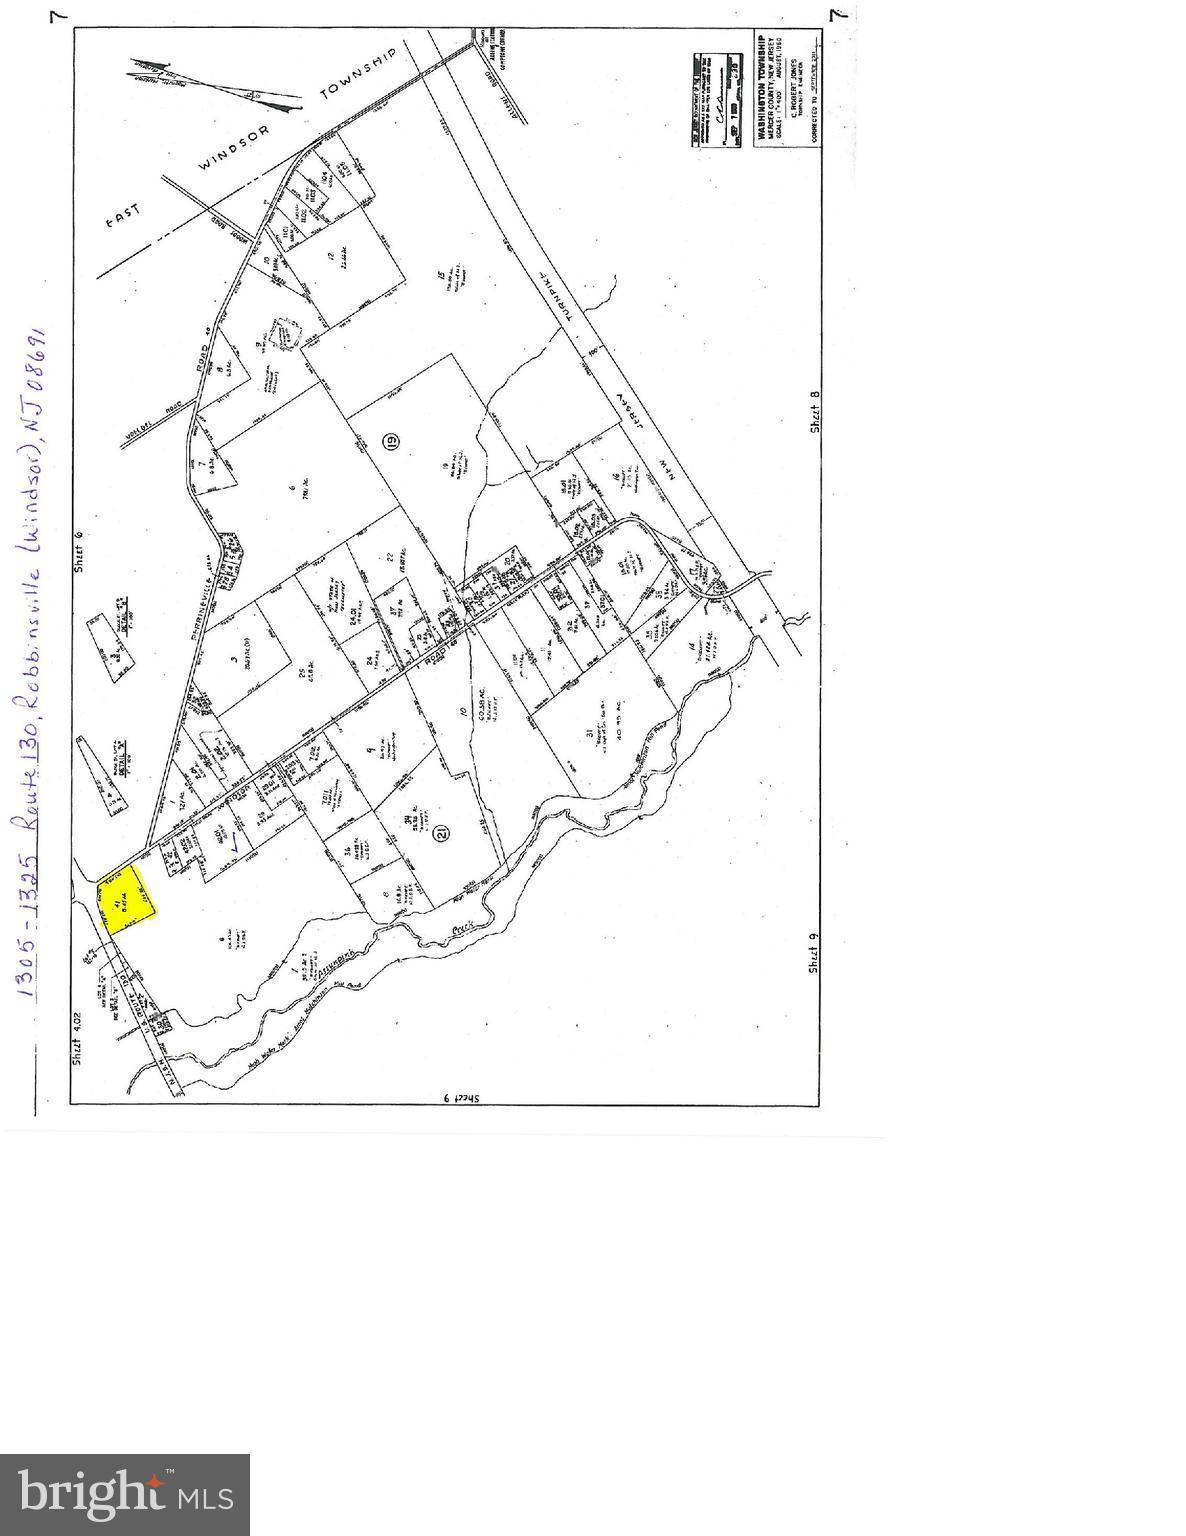 1305 ROUTE 130, ROBBINSVILLE, NJ 08691